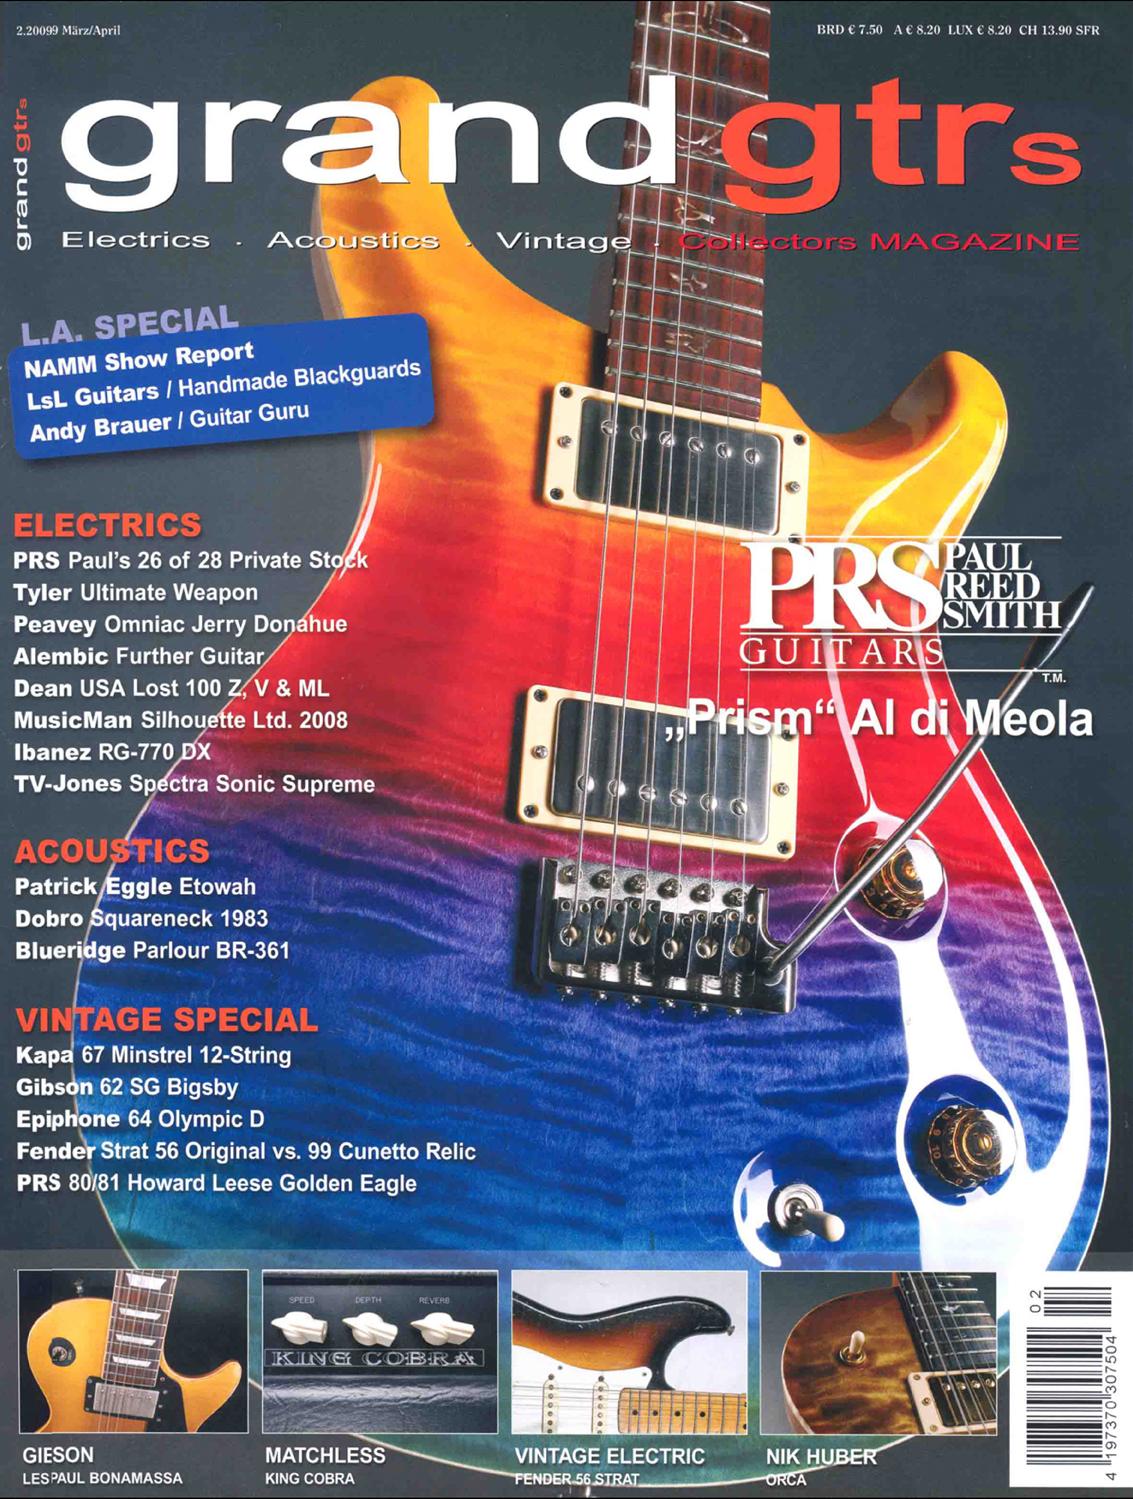 Copy of 2009 Grand Guitars